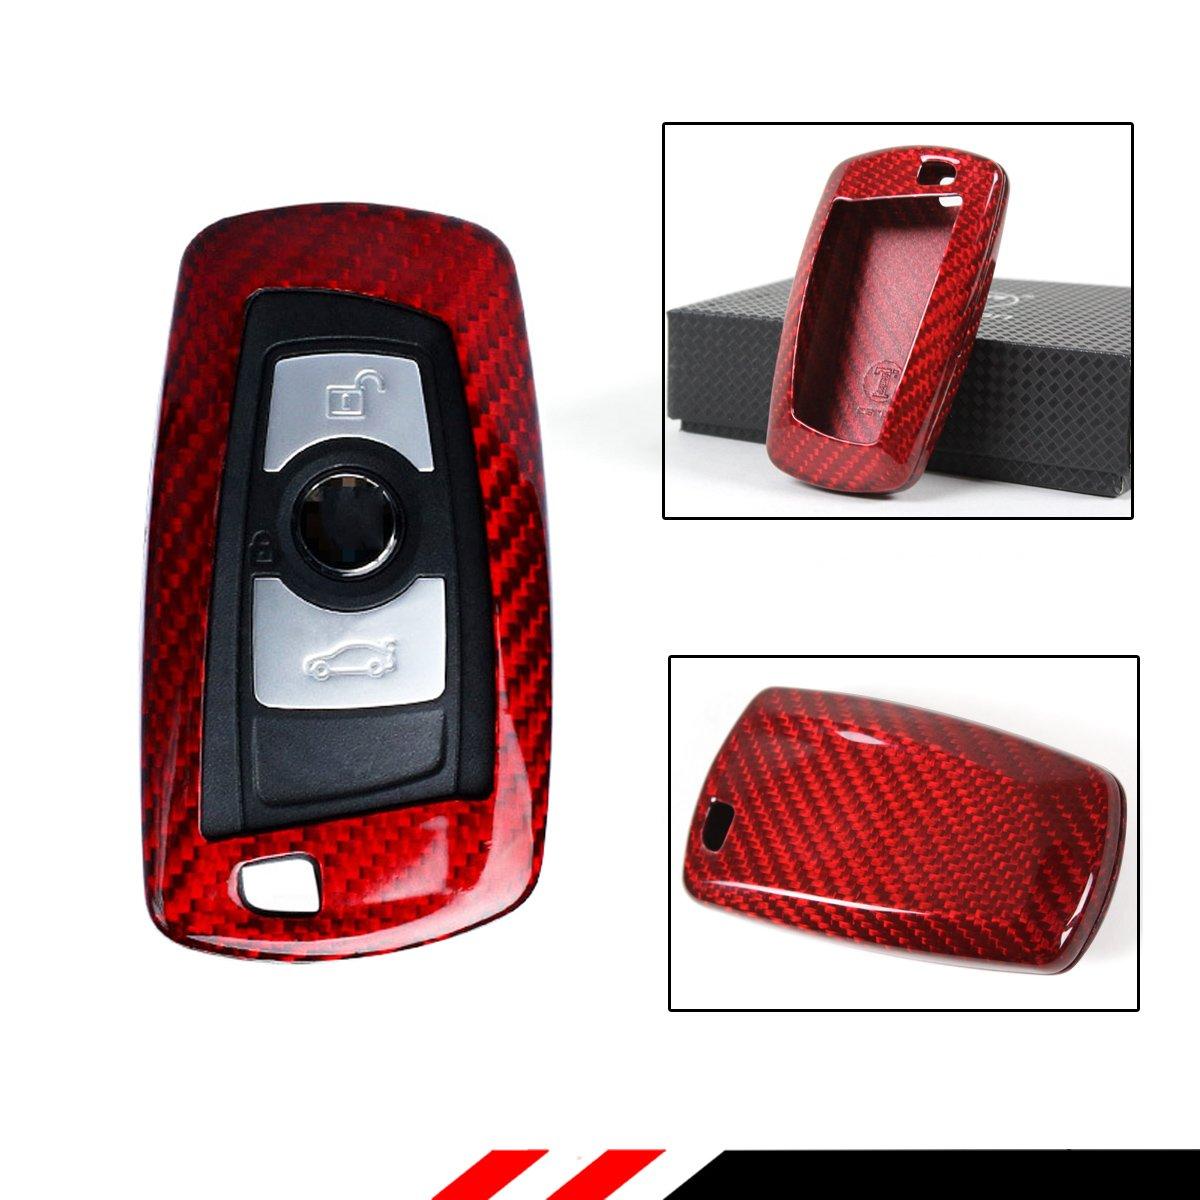 Luxury赤カーボンファイバーSnap On Case For BMW 1 / 2 / 3 / 4 / 5 / 6シリーズキーFobリモート B079C88TQG